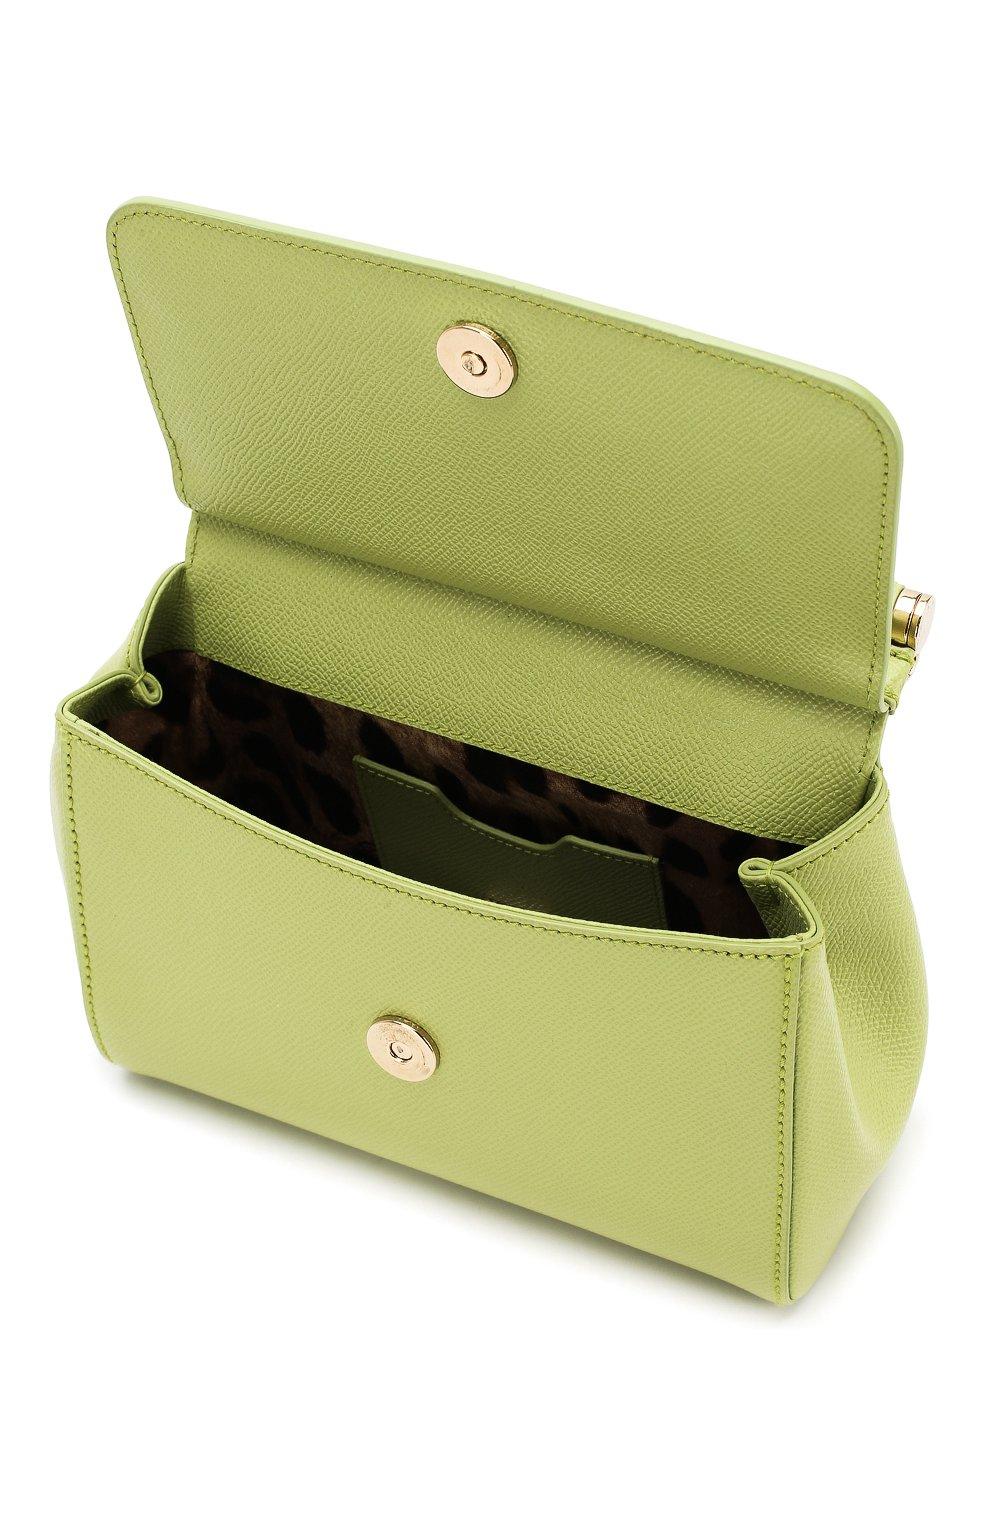 Сумка Sicily small Dolce & Gabbana зеленая цвета | Фото №4